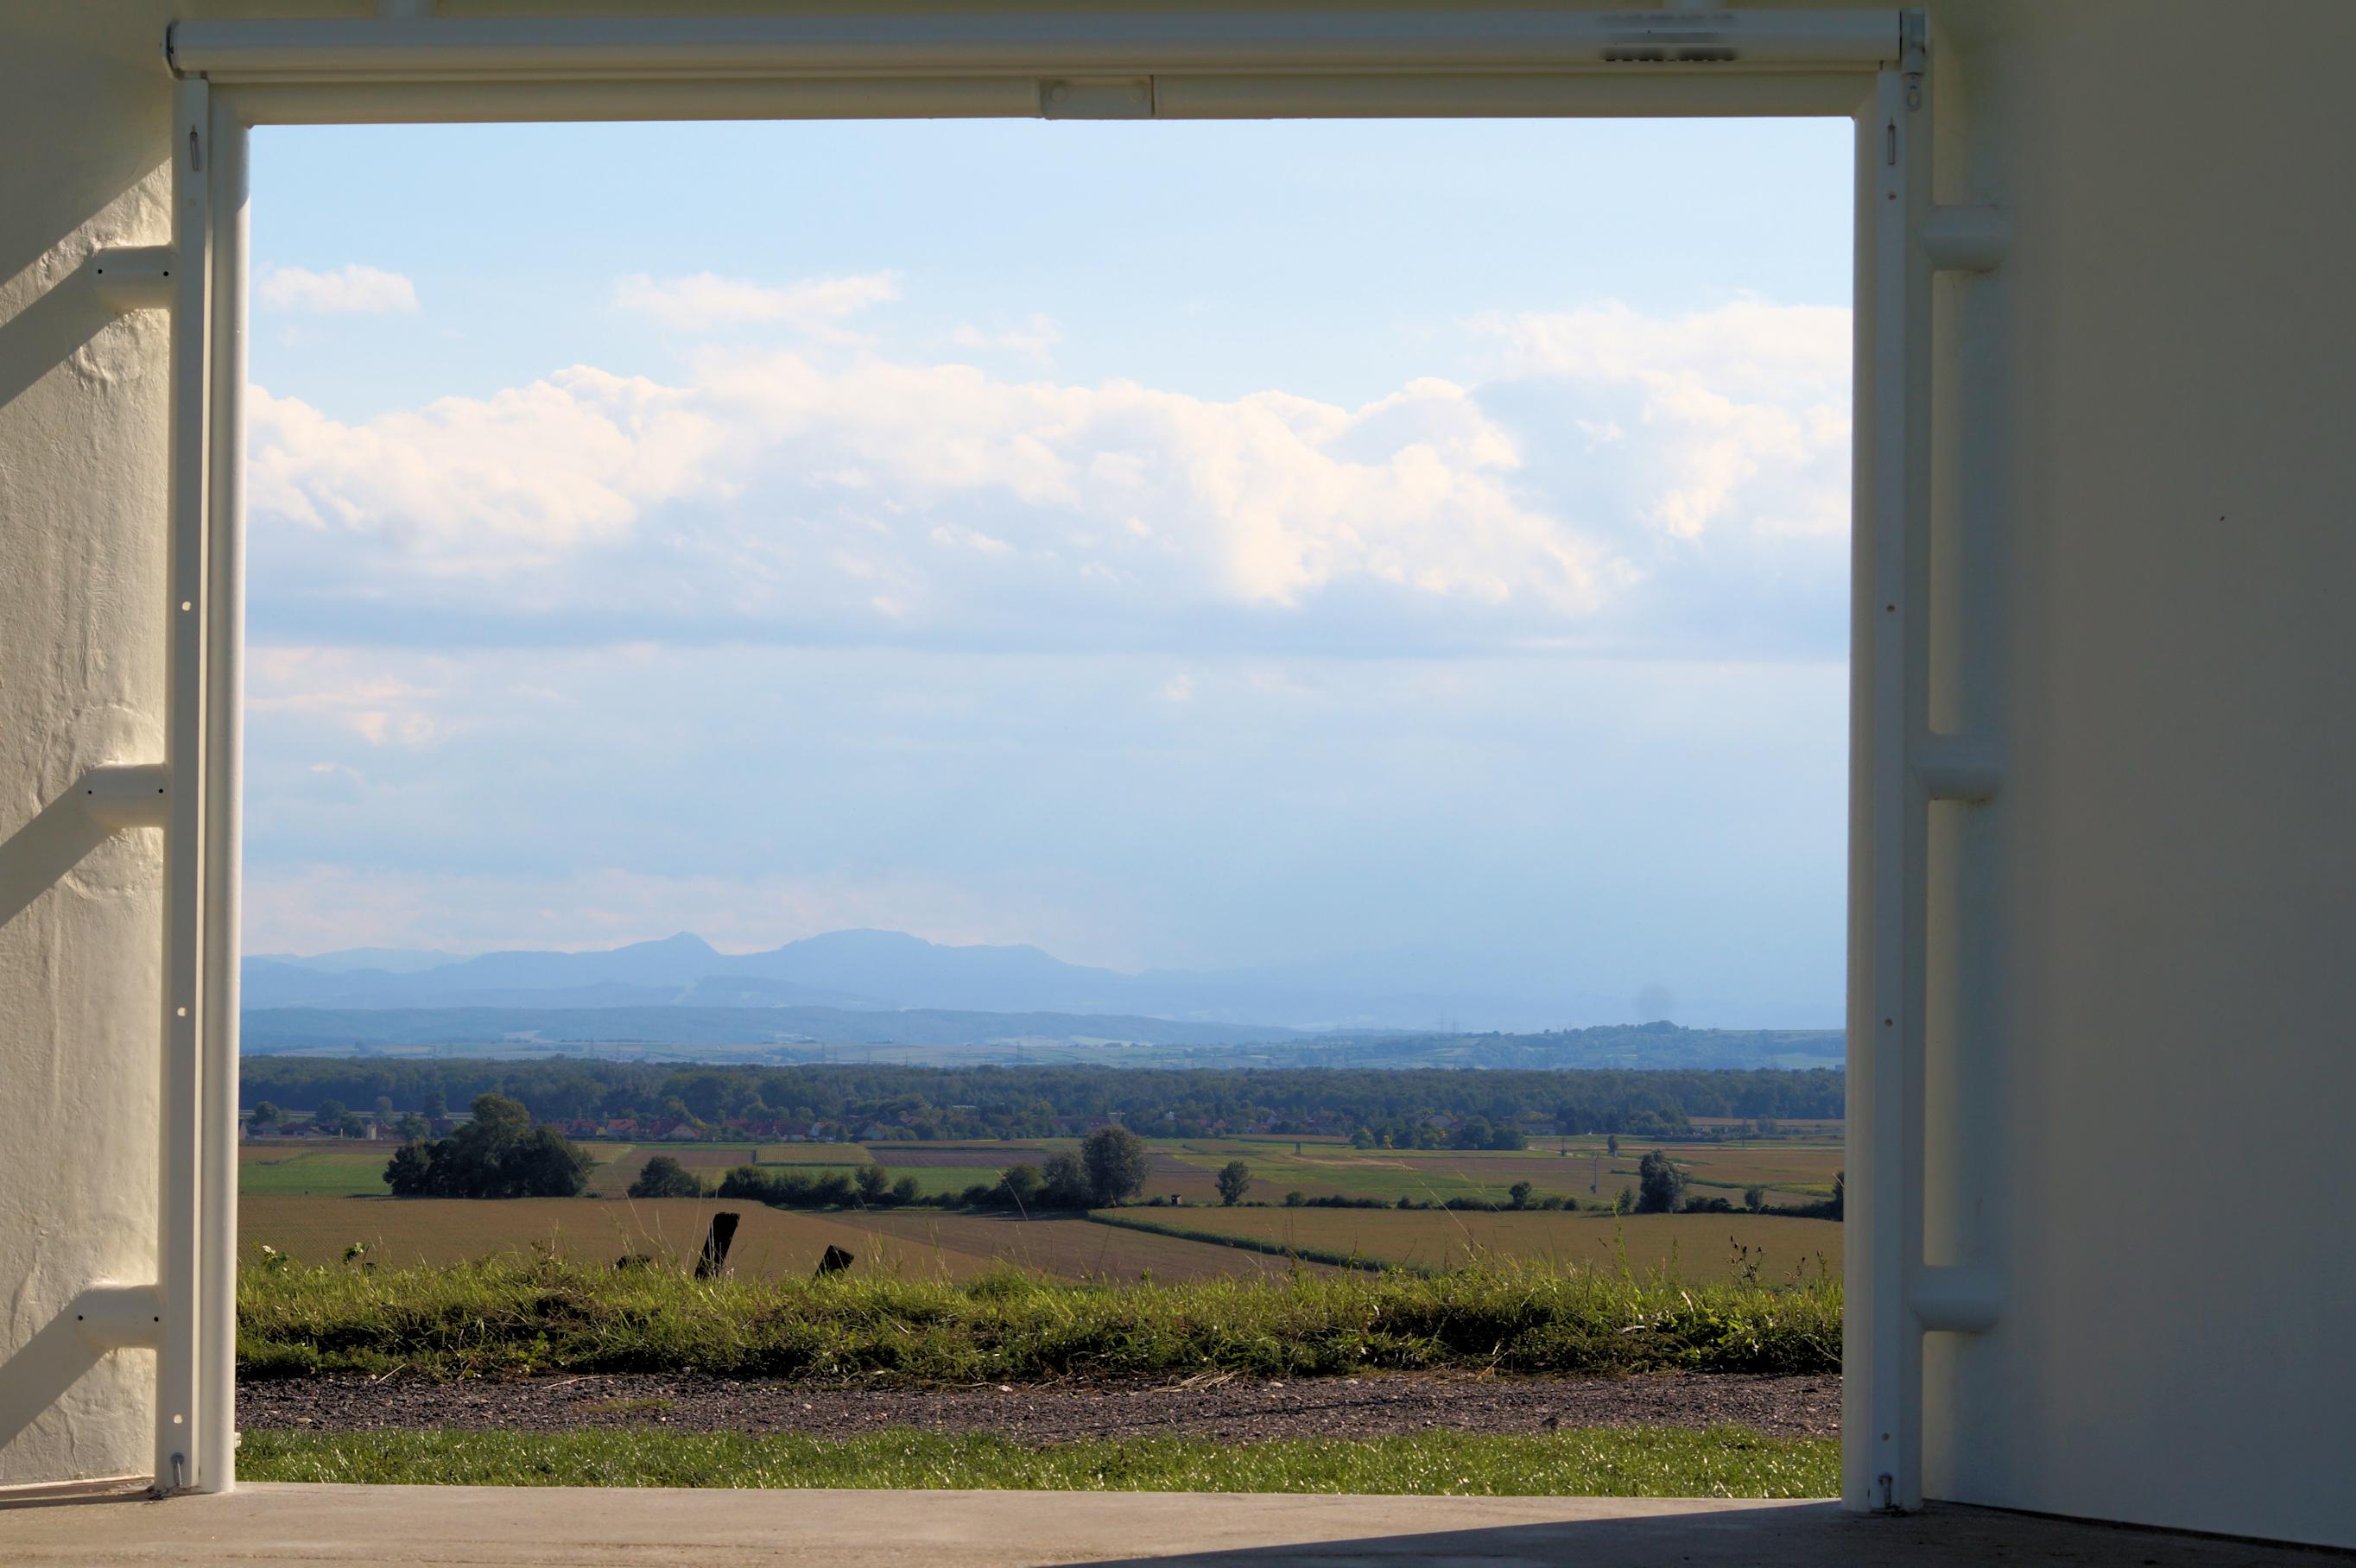 Blick aus dem fenster land  File:Königsbrunn am Wagram - Wagramfenster - Blick durchs Fenster ...